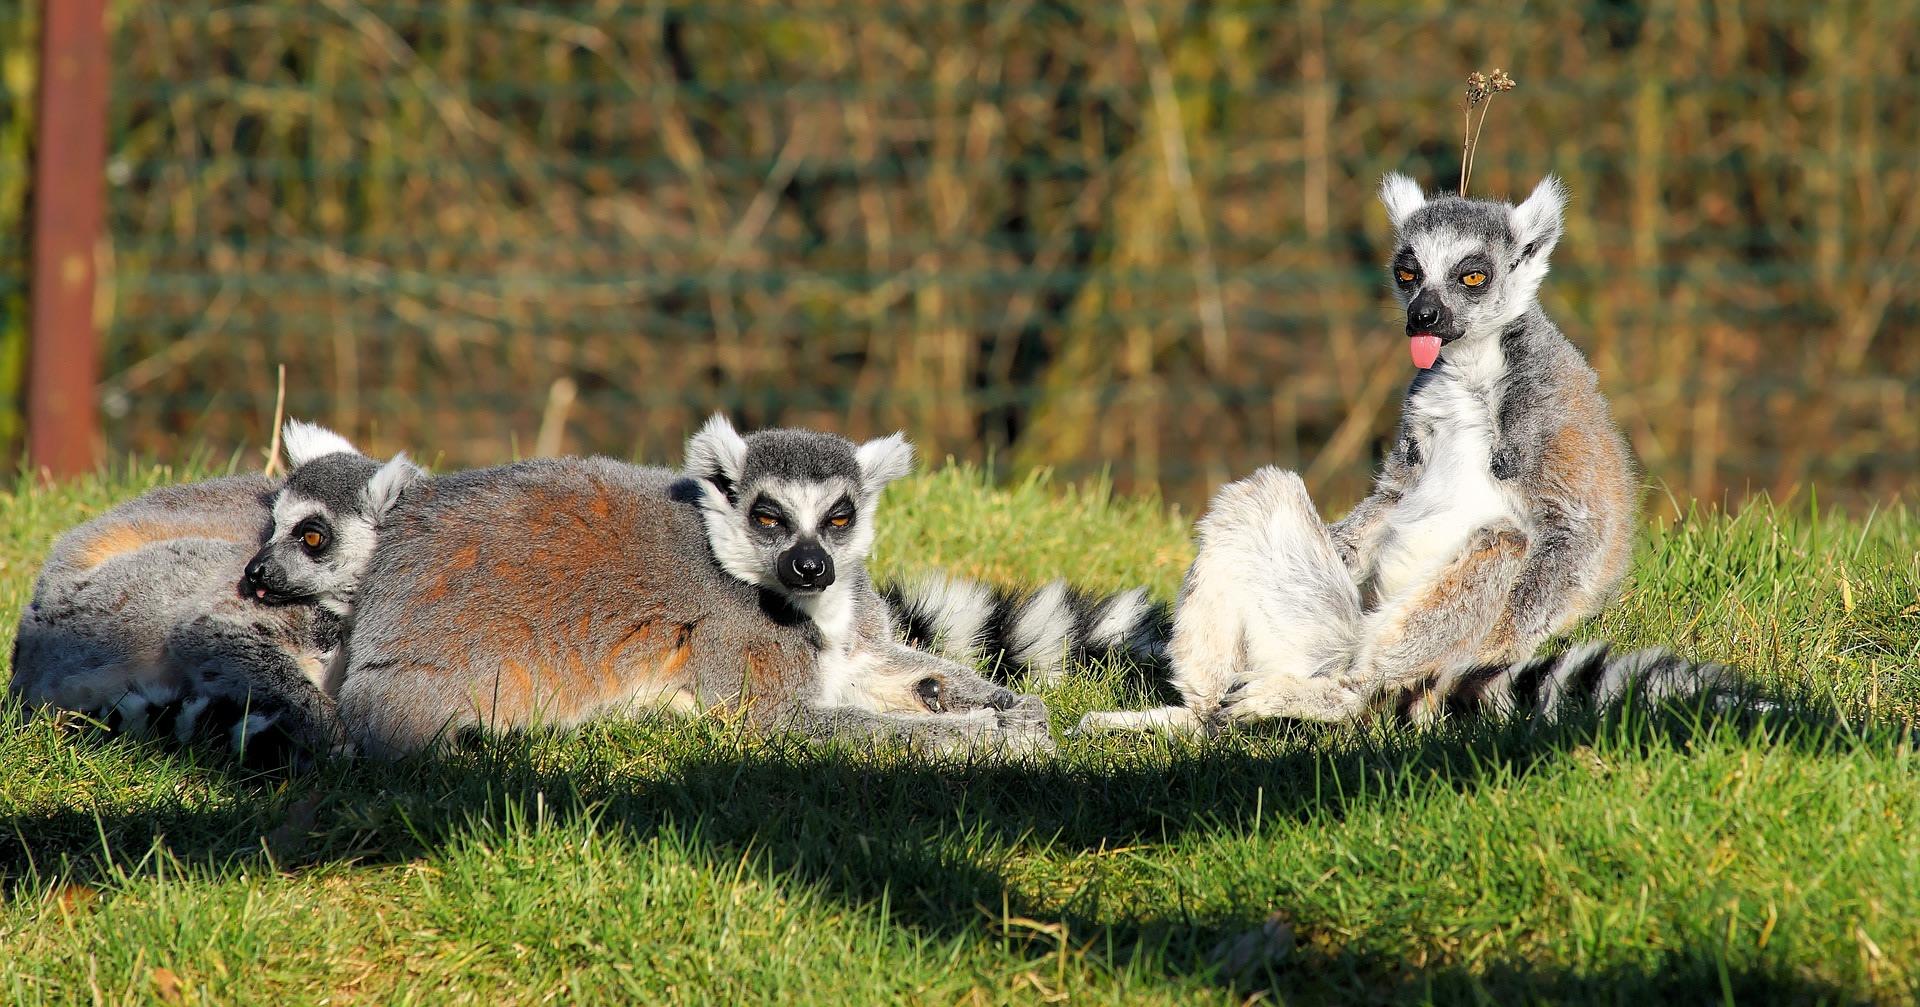 Spot Lemurs in the Wild